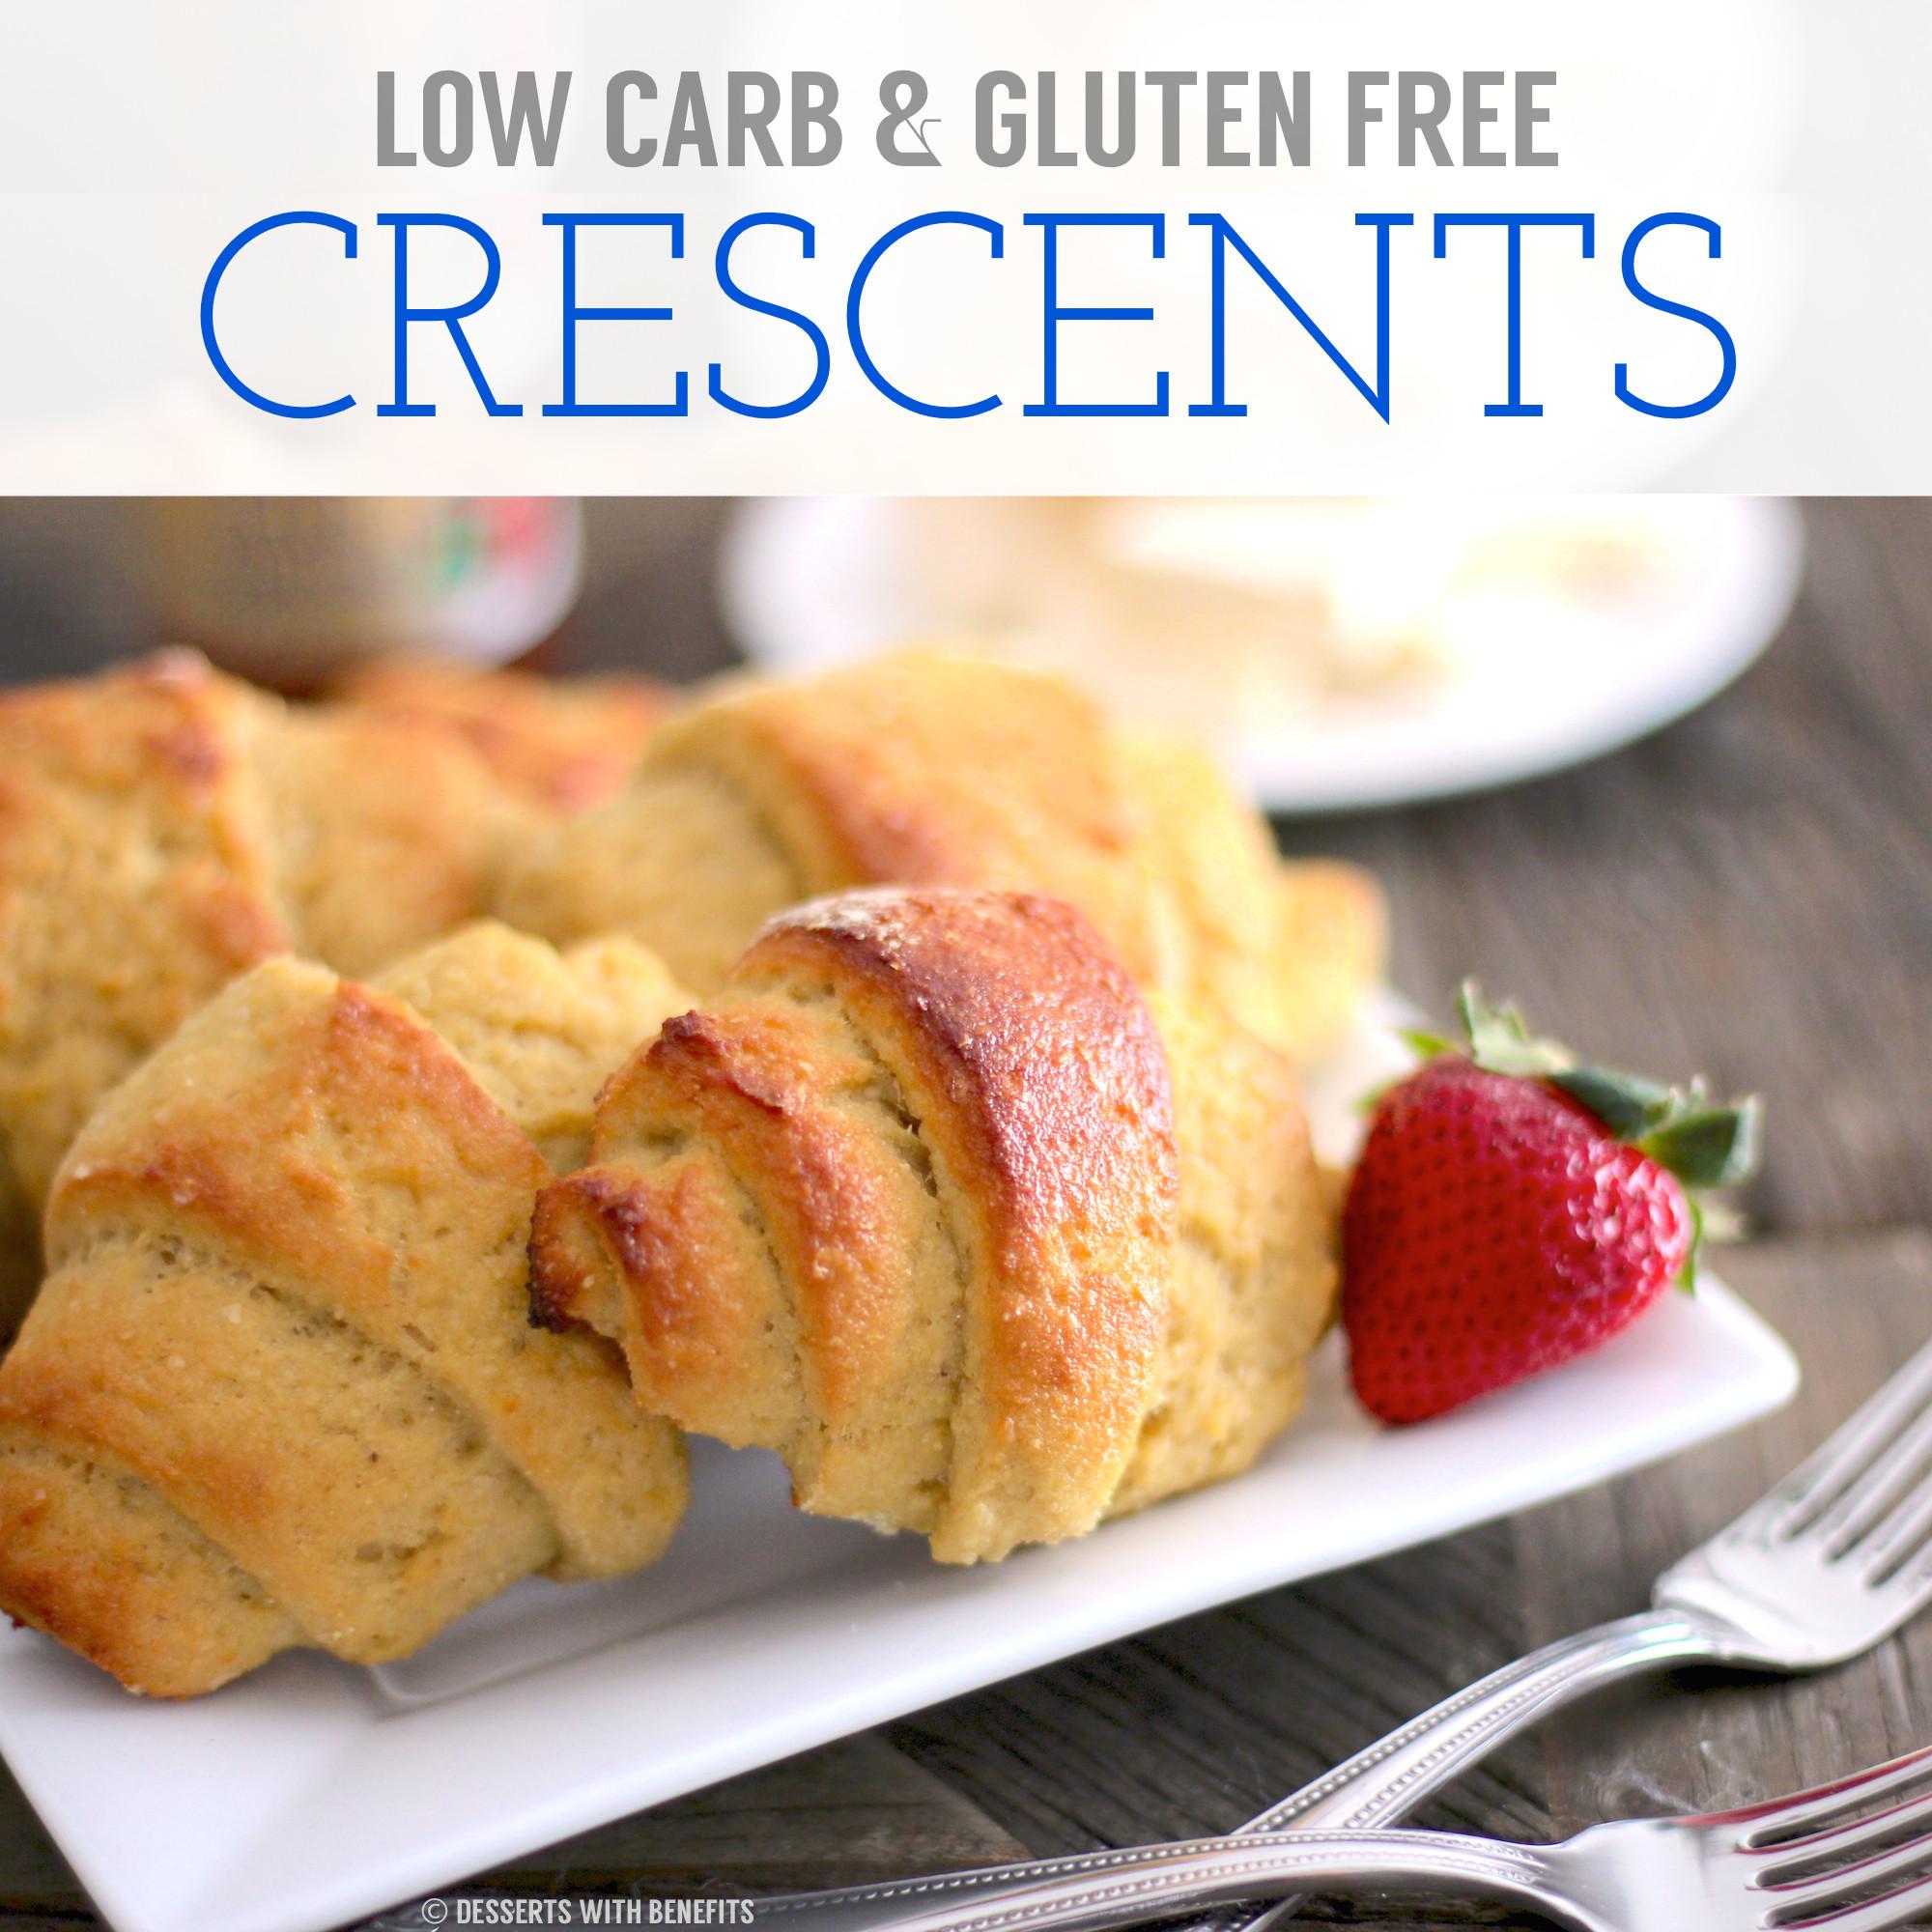 Low Fat Sugar Free Desserts  Healthy Homemade Gluten Free Crescent Rolls